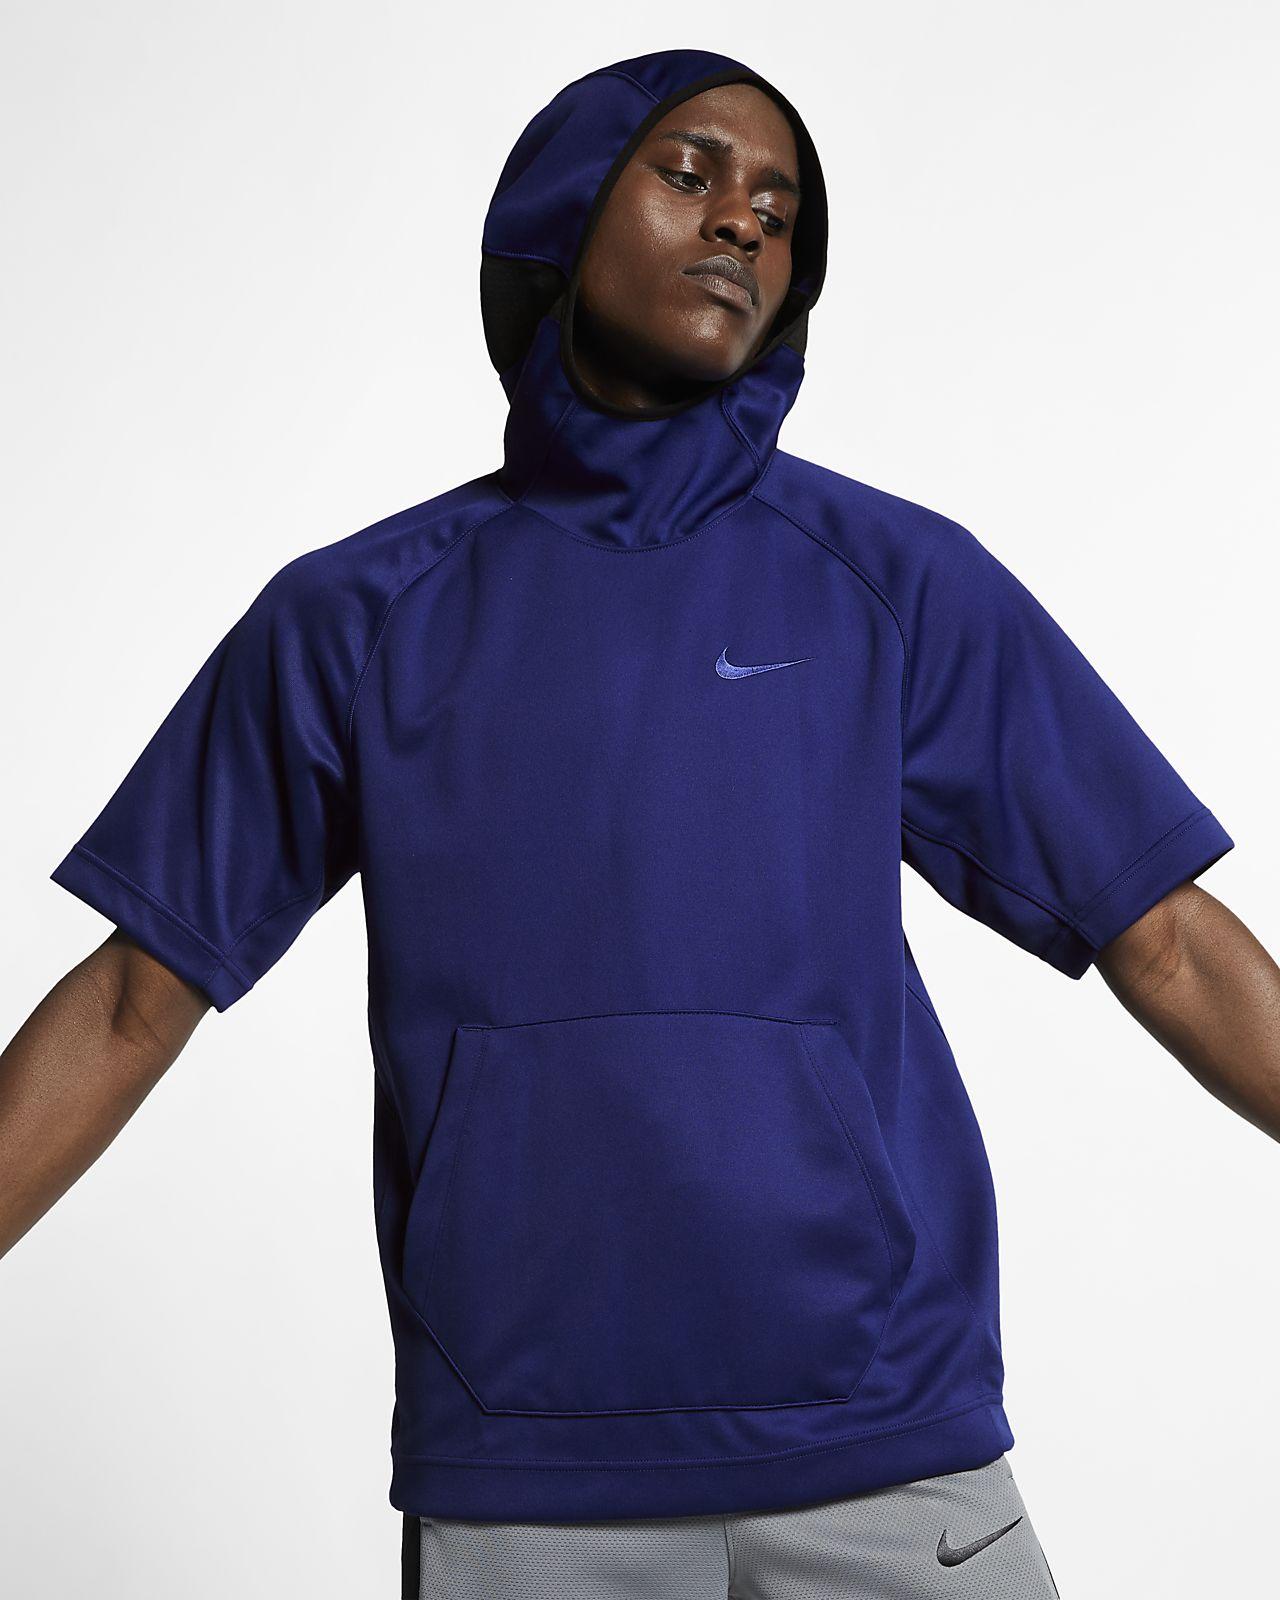 Nike Spotlight Men's Short-Sleeve Basketball Hoodie